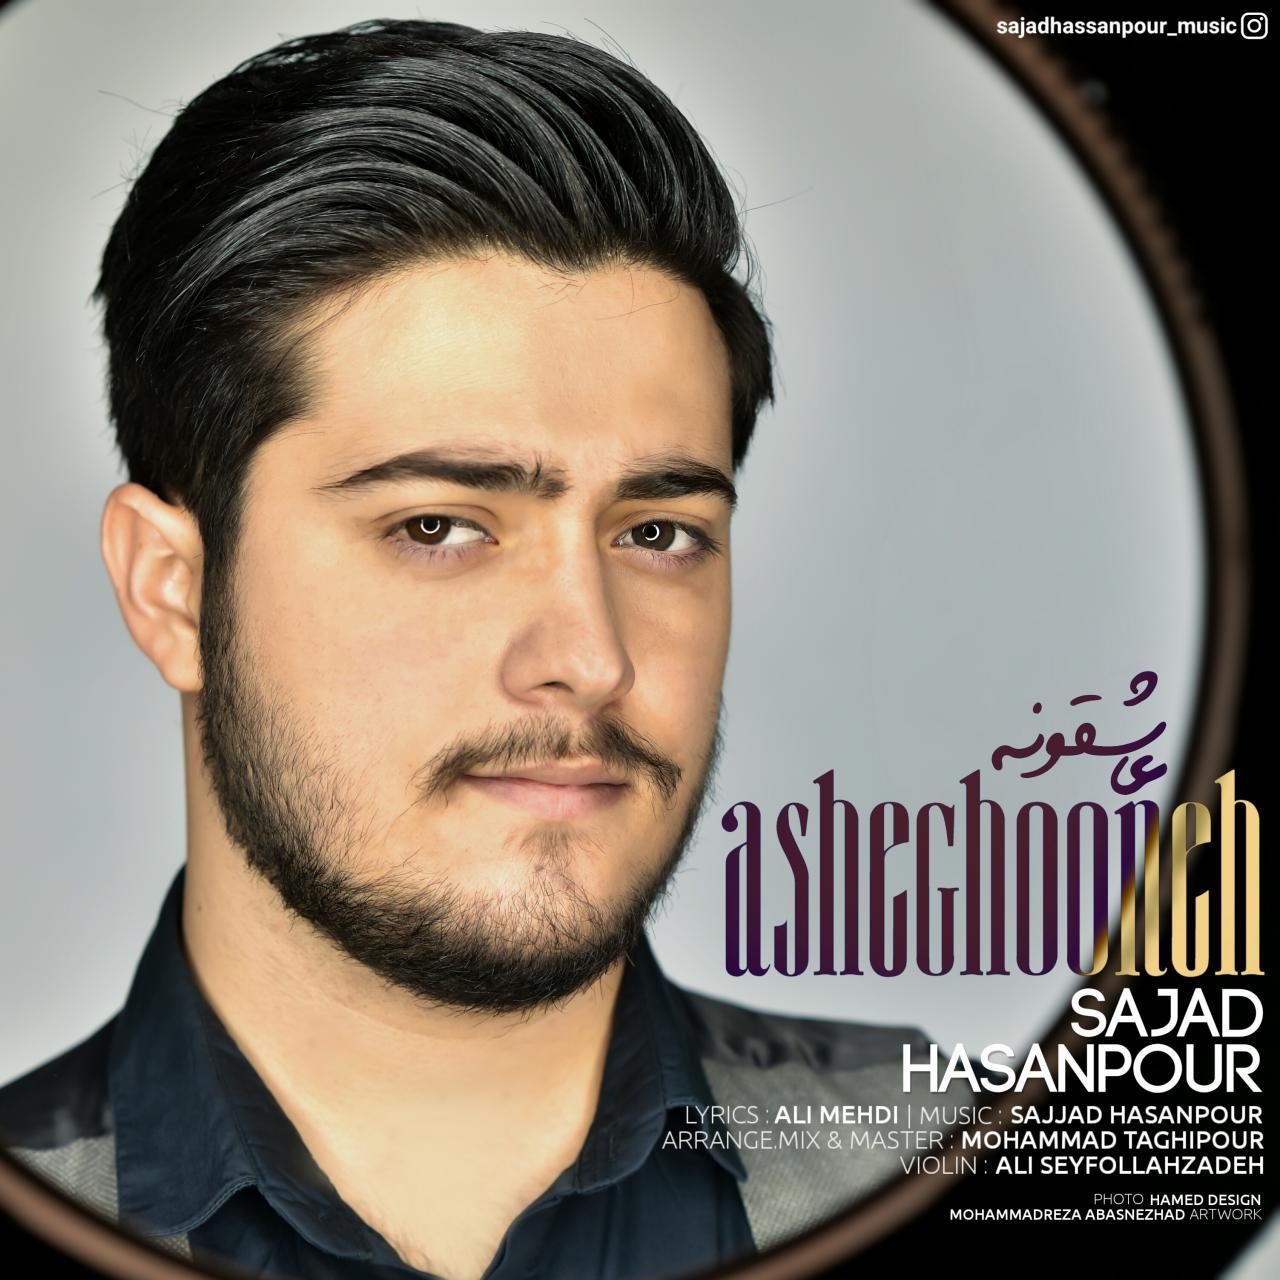 Sajad Hasanpour – Asheghooneh